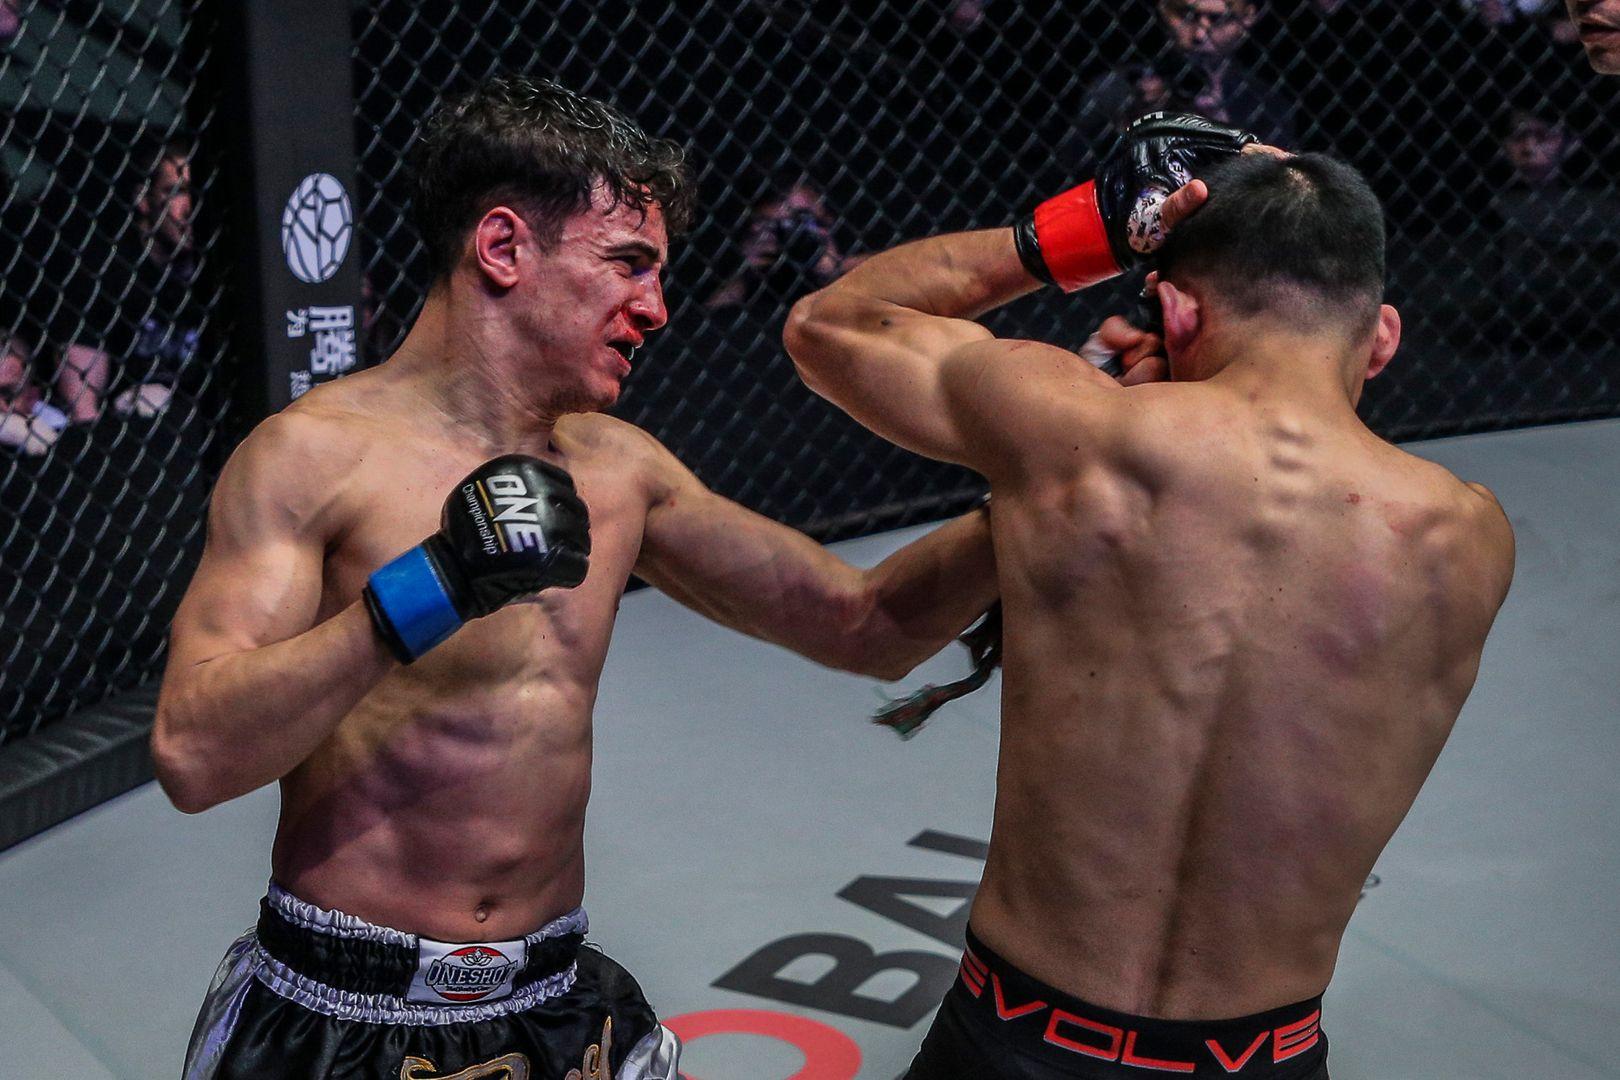 Italian Muay Thai fighter Joseph Lasiri defeats Hiroki Akimoto at ONE: A NEW ERA